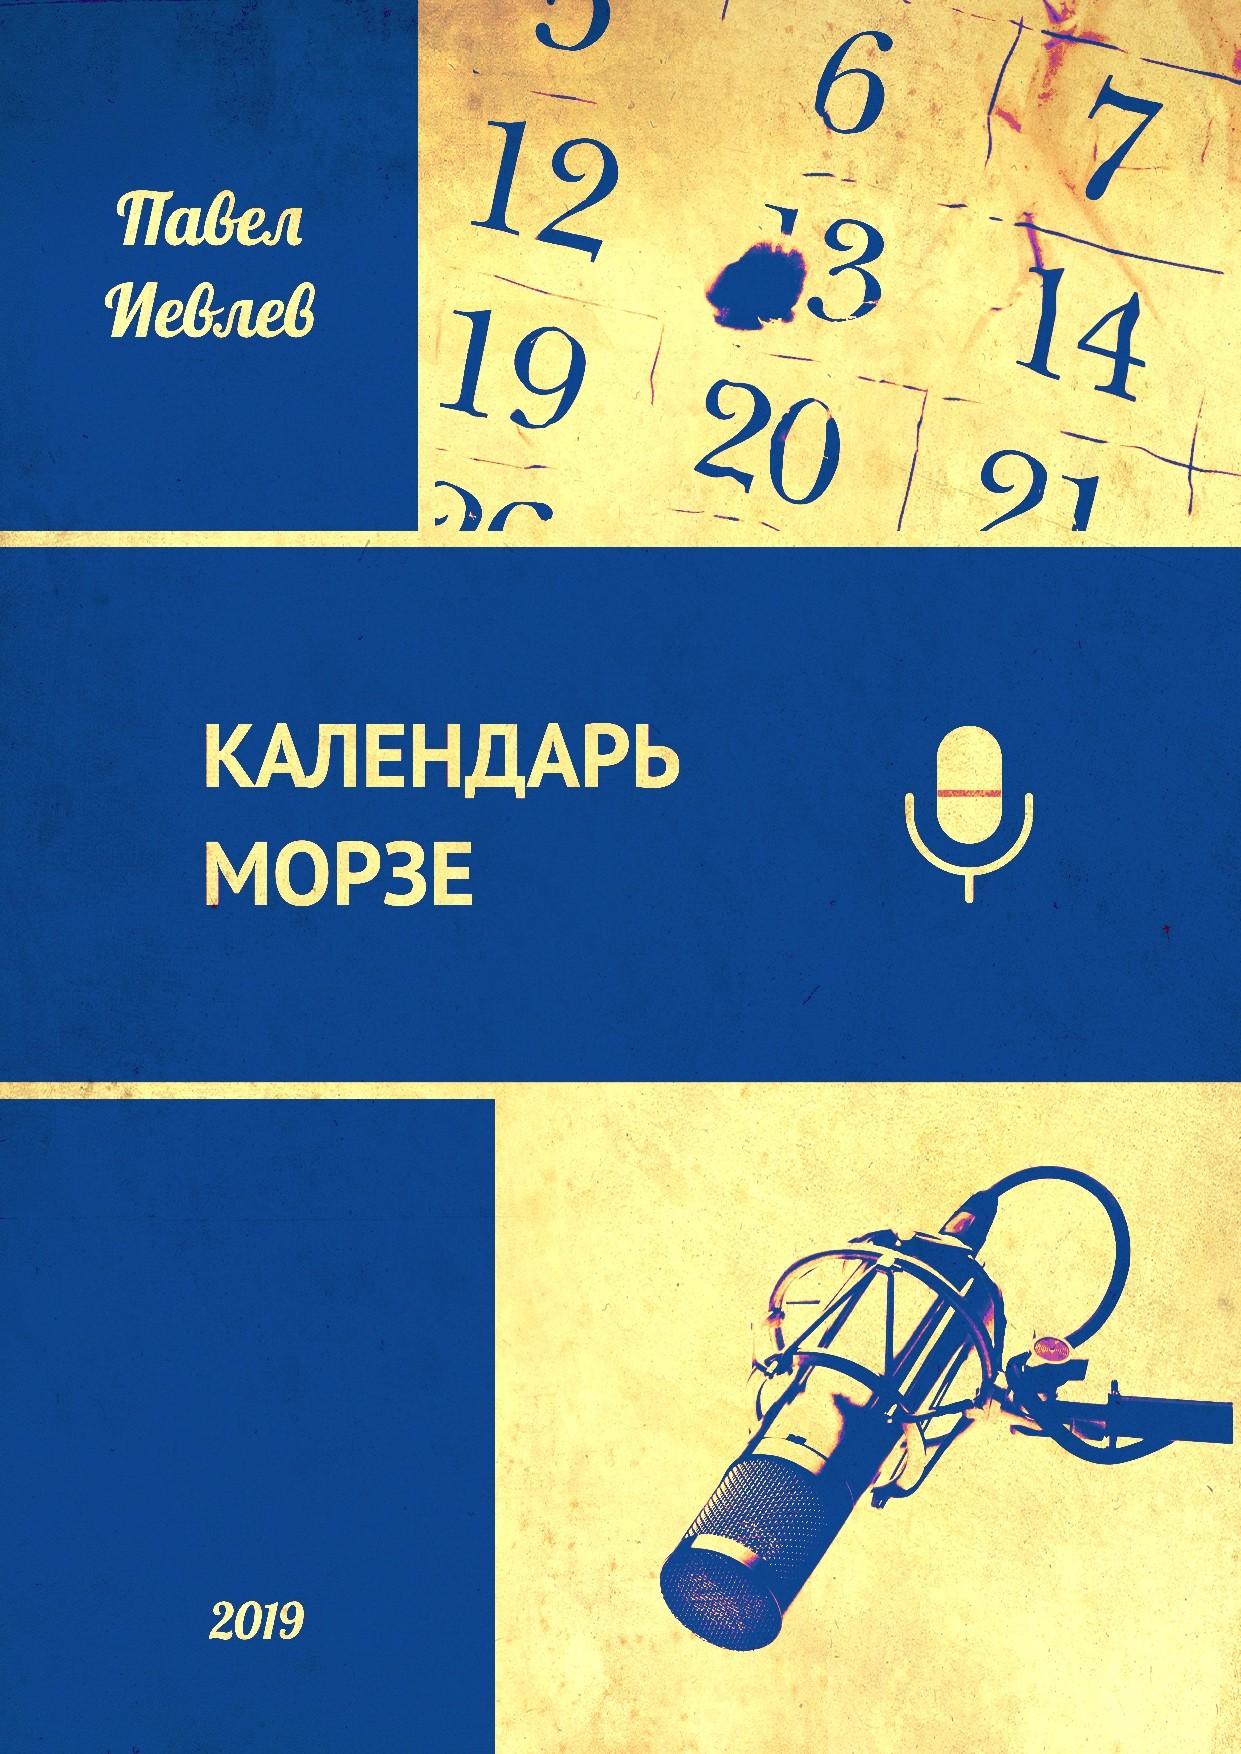 Календарь Морзе, книга Павла Иевлева